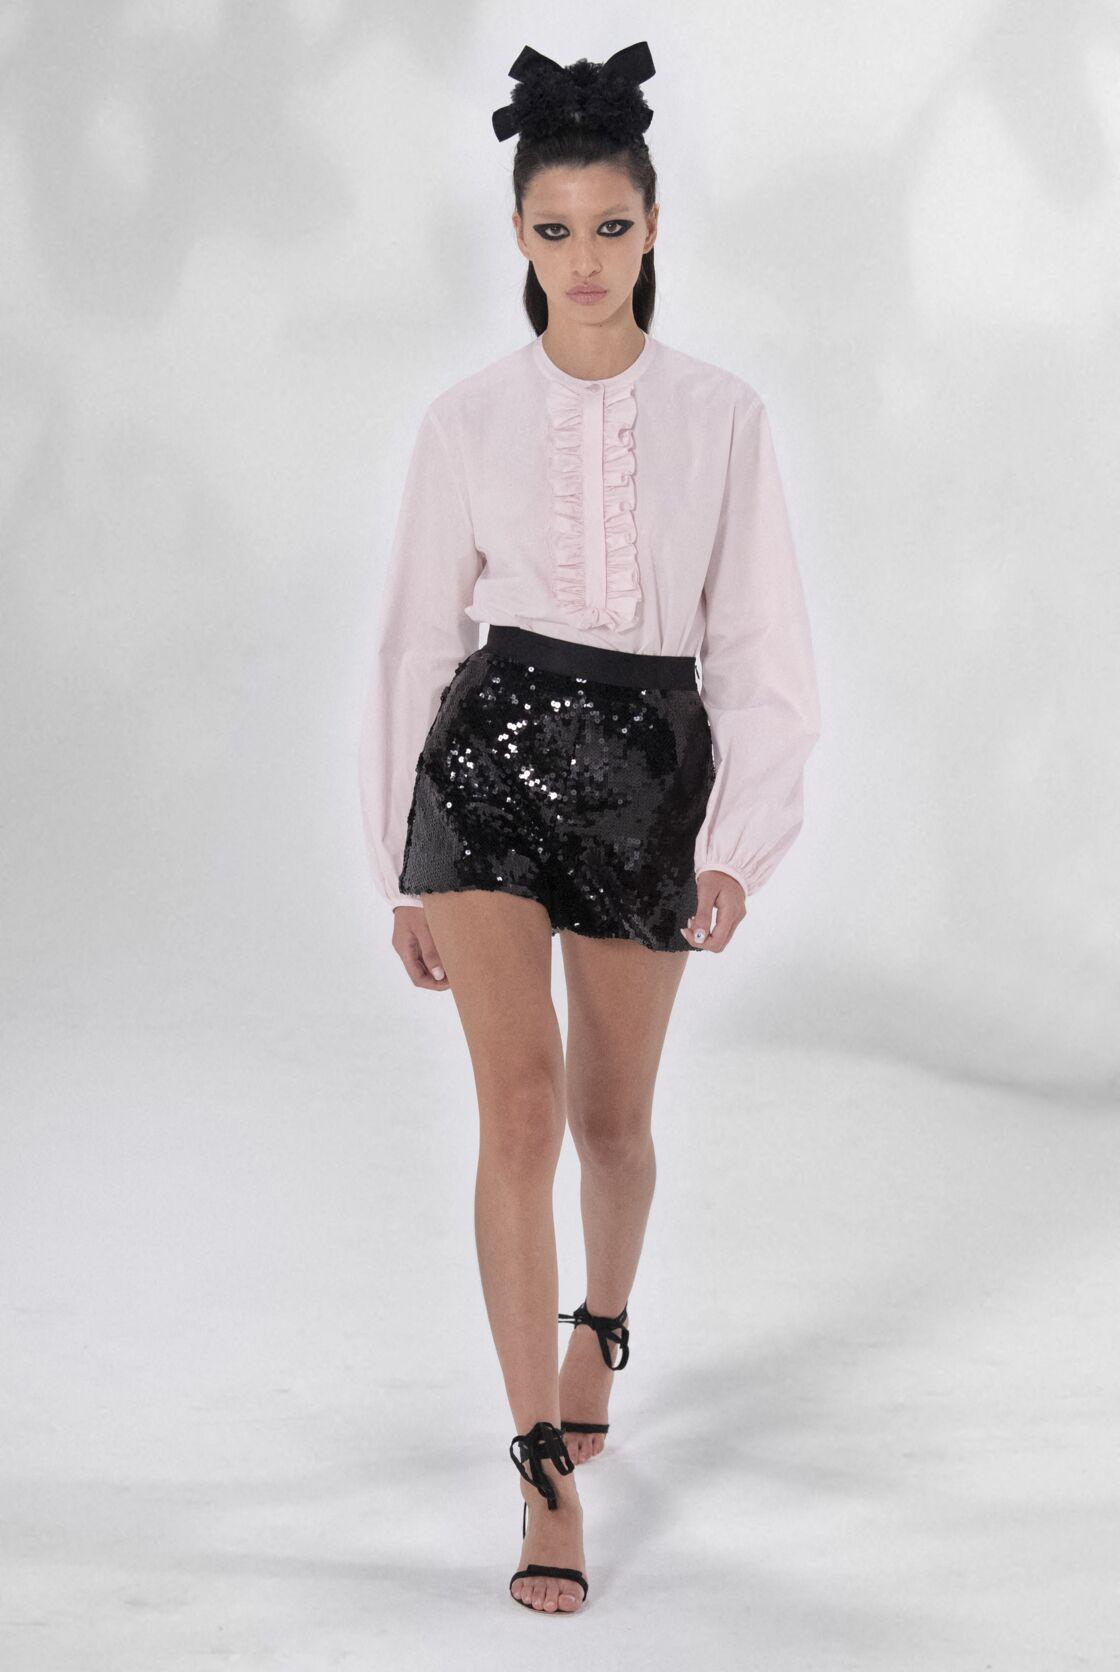 Comme chez Giambattista Valli, la chemise rose chic se porte à merveille avec une jupe courte glitter